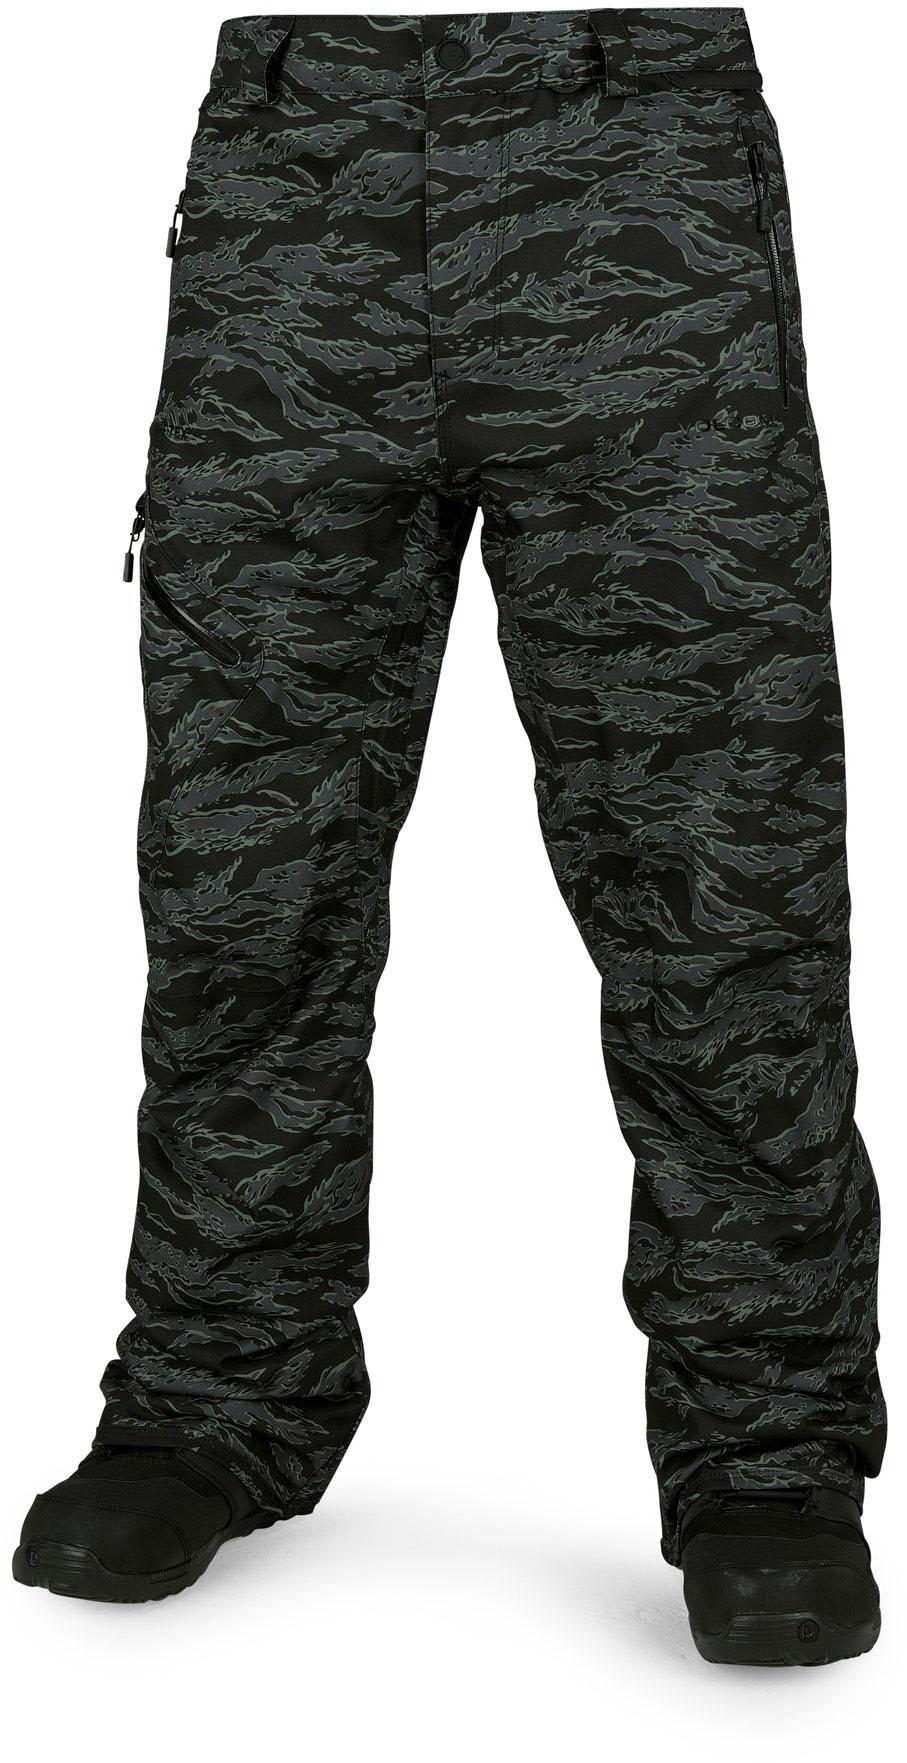 image volcom-l-gore-tex-camouflage-jpg